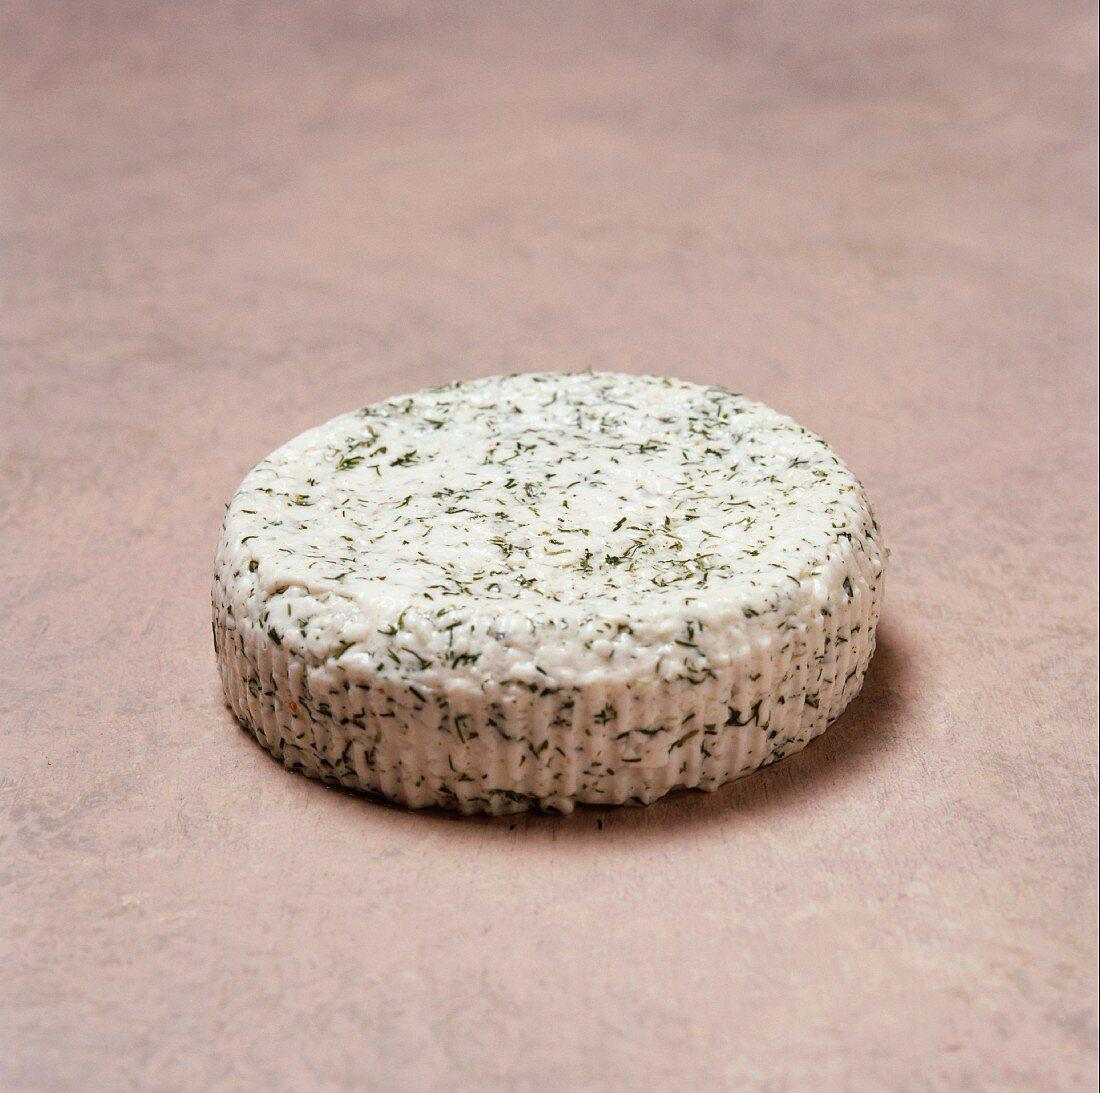 A Round of Garlic Herb Farmers Cheese